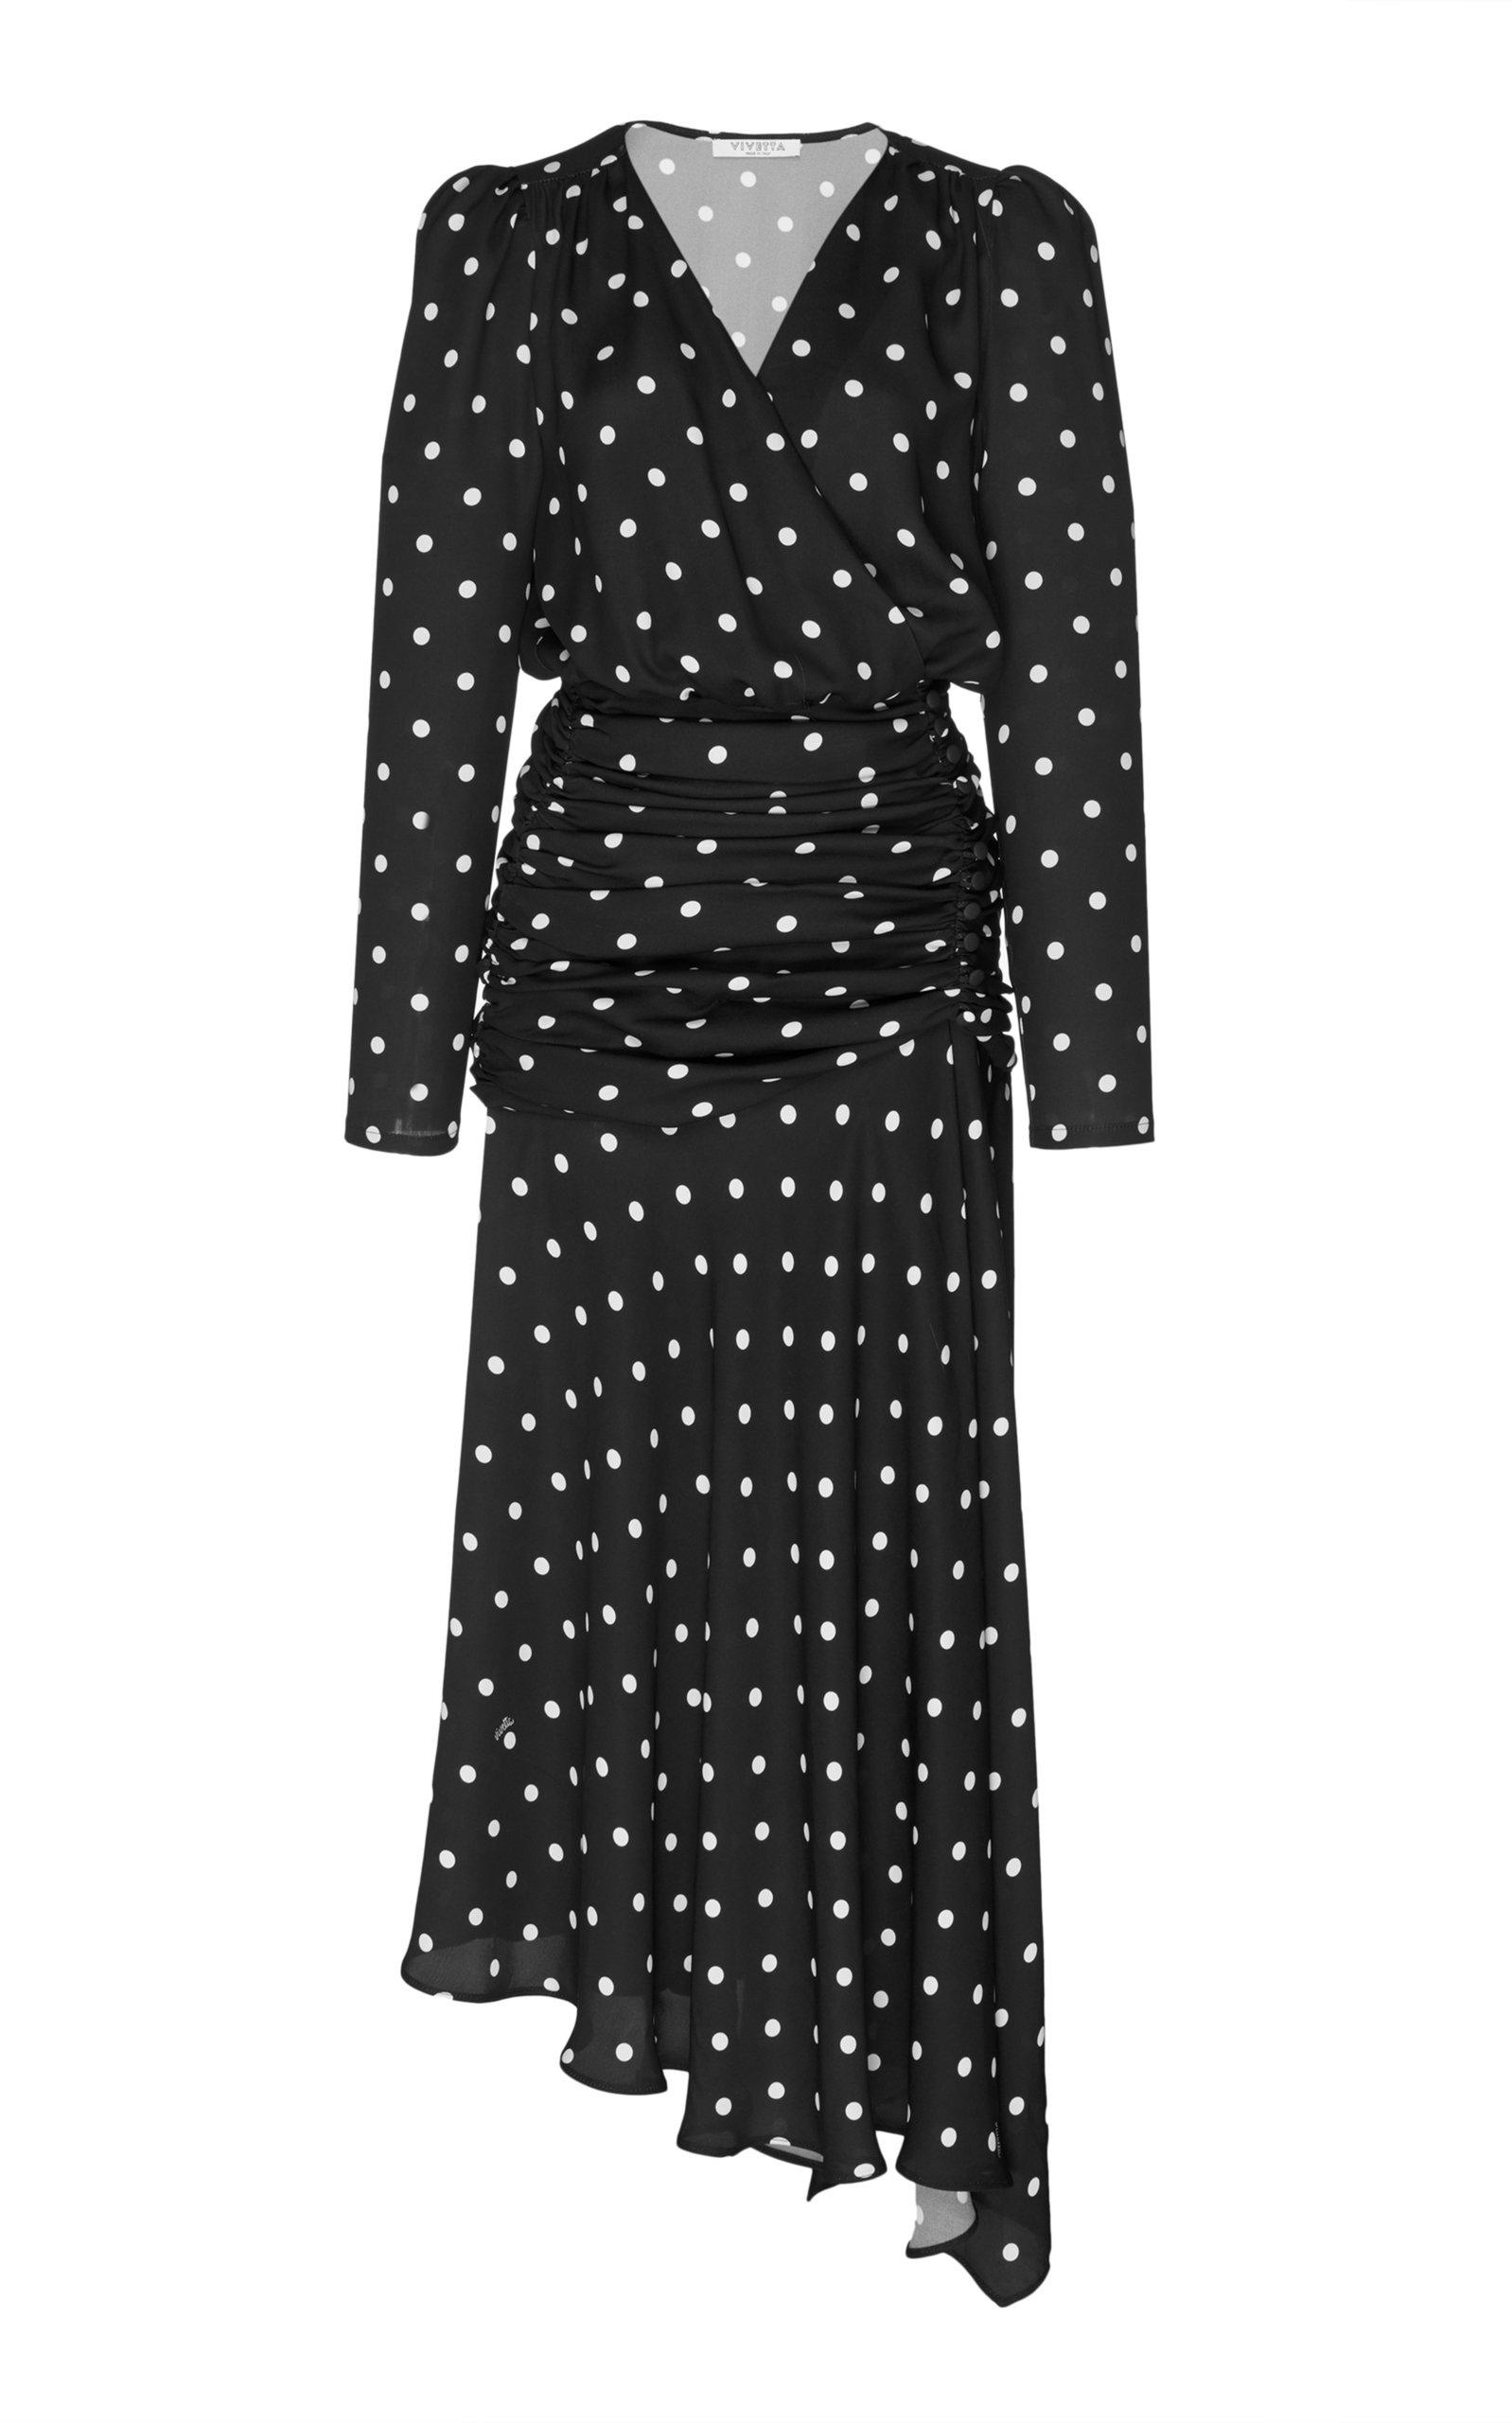 Della Francesca Long Dress in Black/White